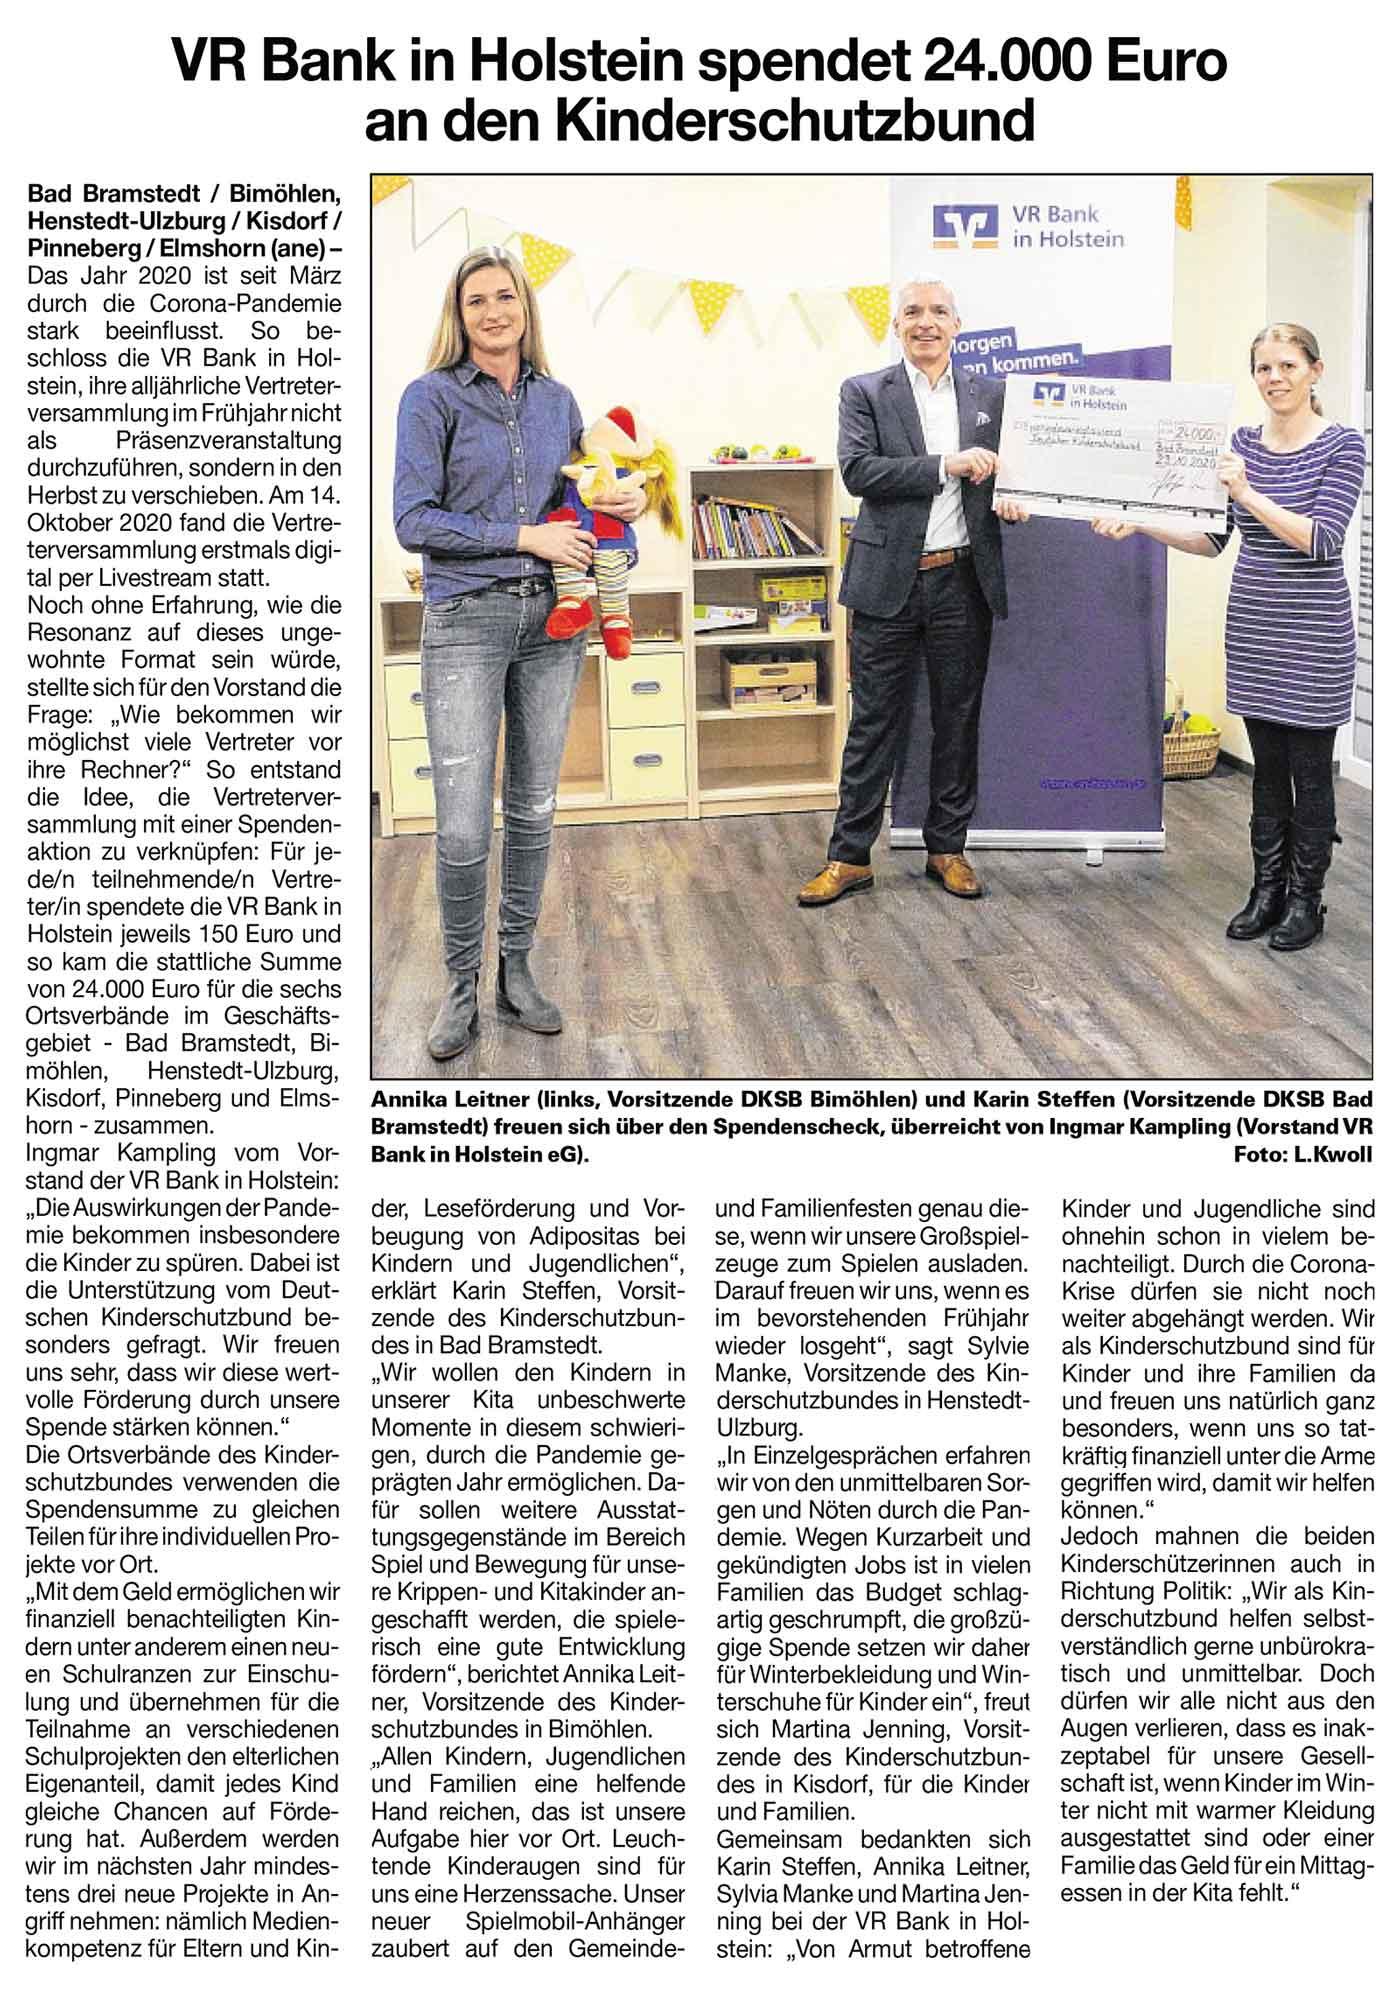 VR Bank in Holstein spendet 24.000 Euro